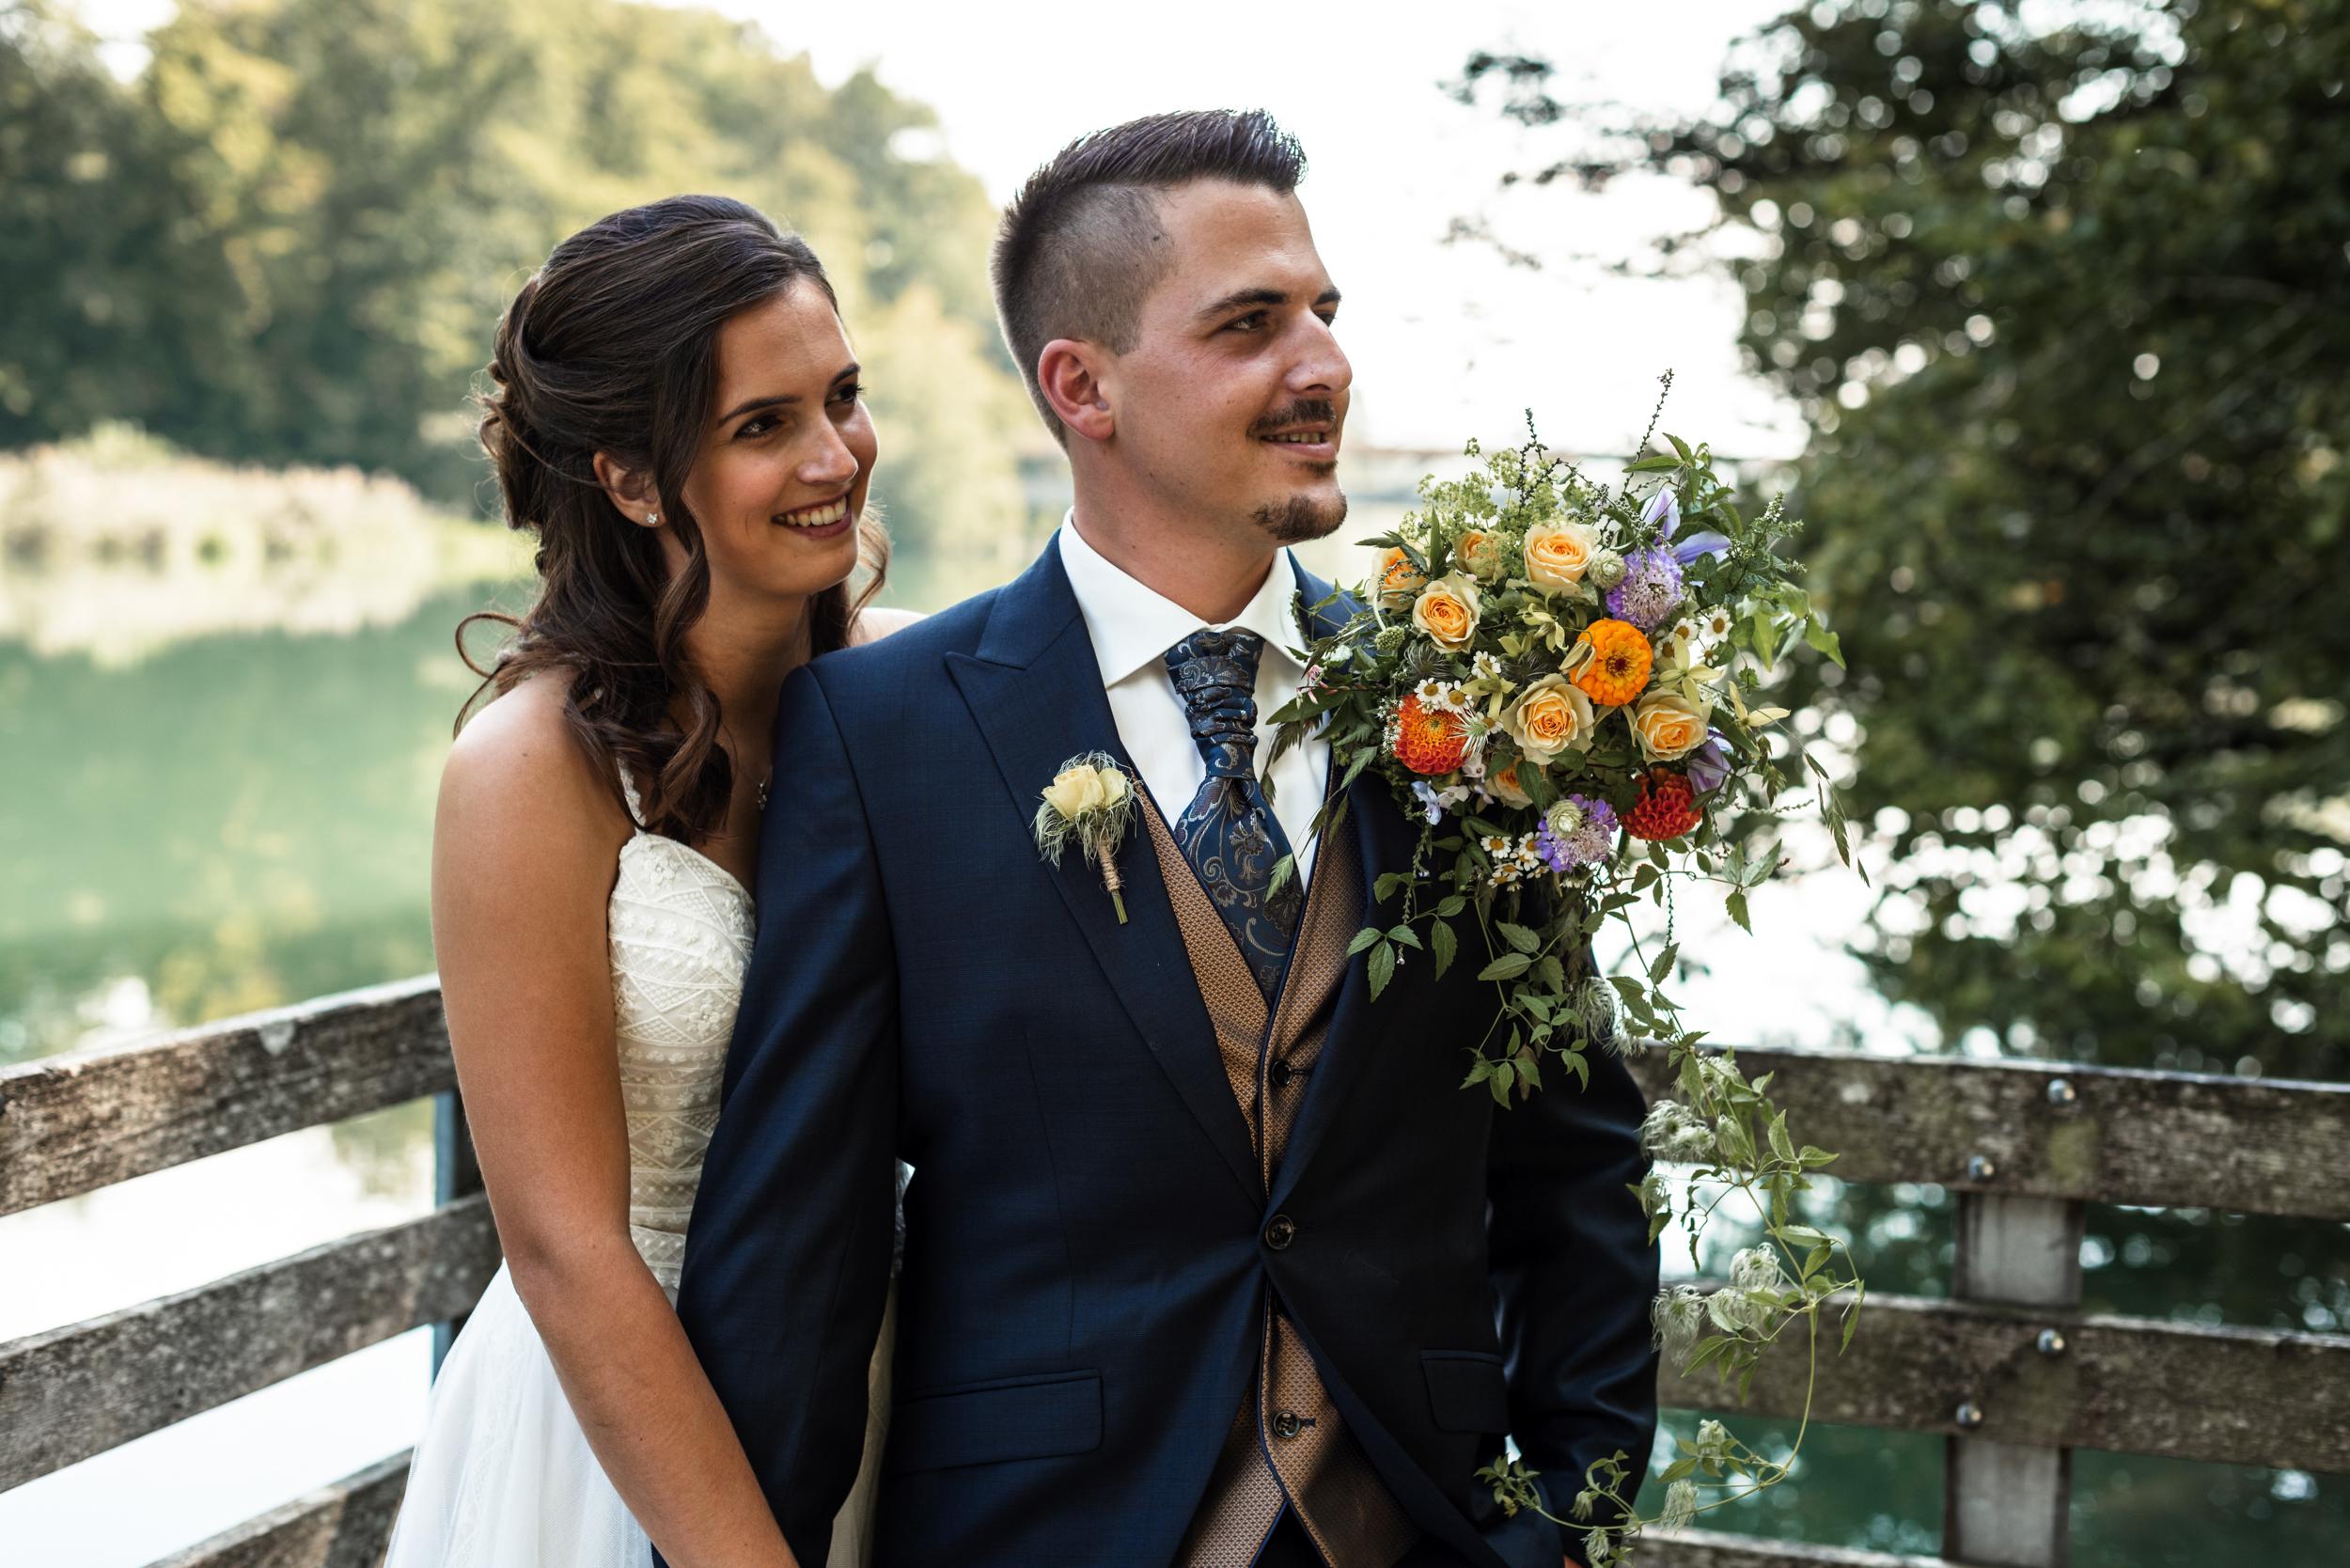 Hochzeit_Rilana-Fabian_38